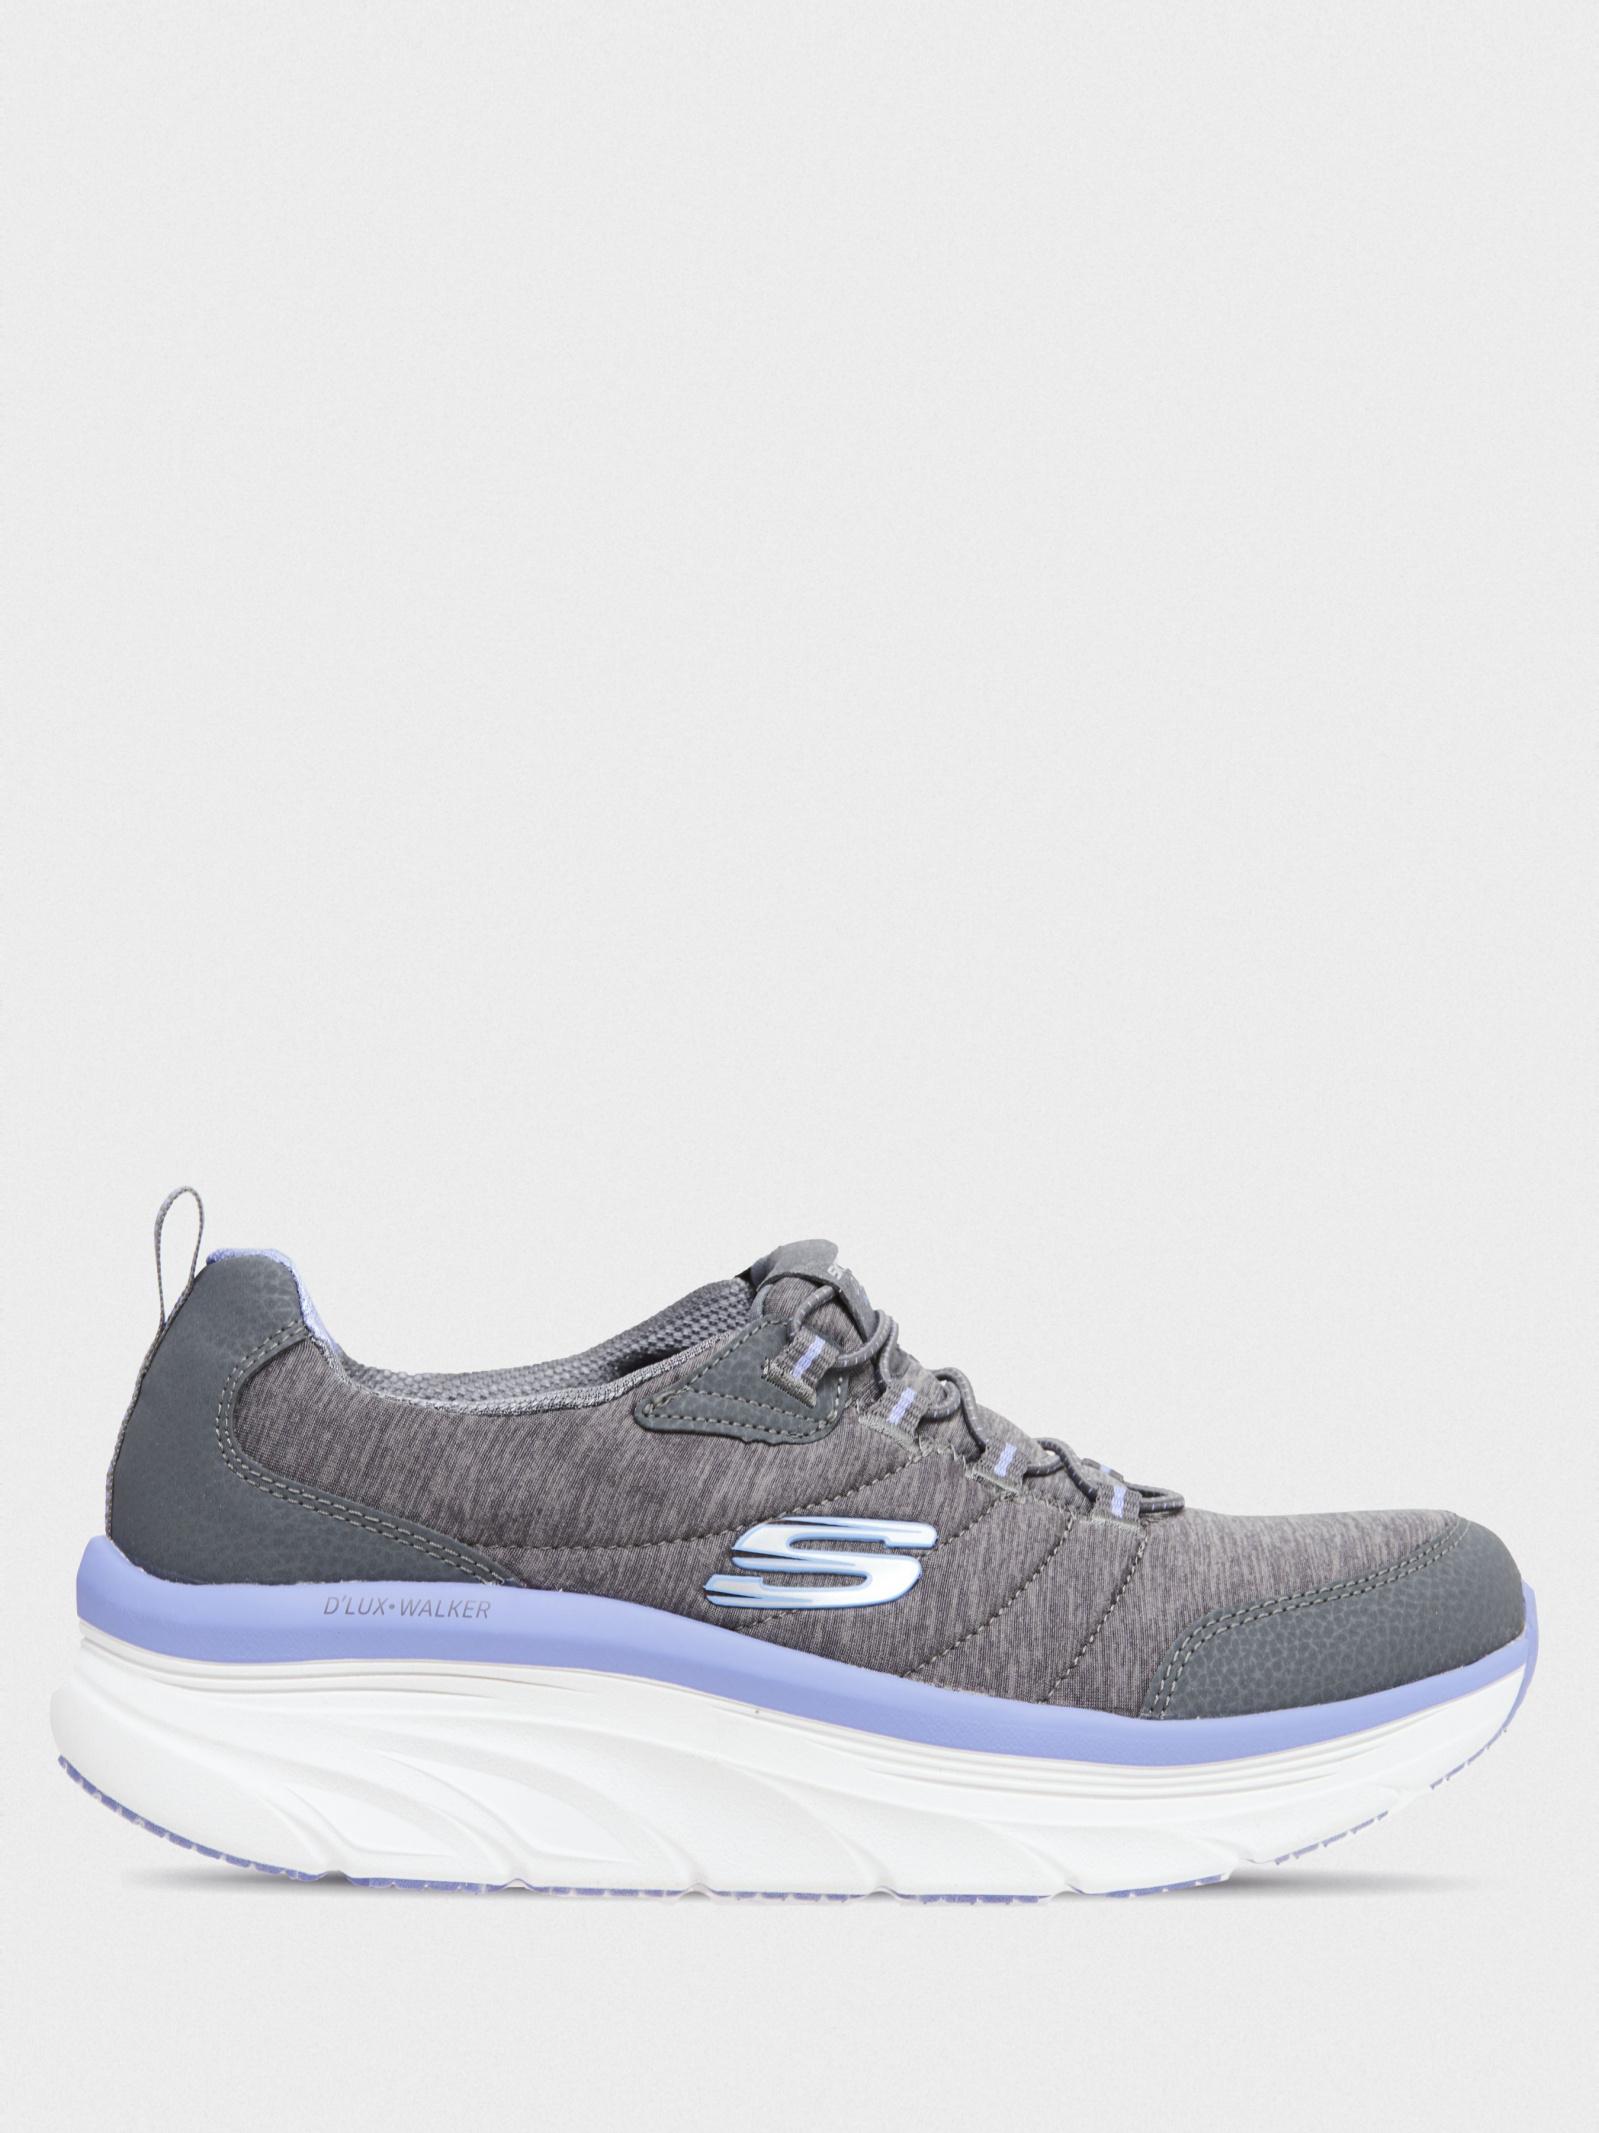 Кроссовки для женщин Skechers Sport Womens KW5673 продажа, 2017